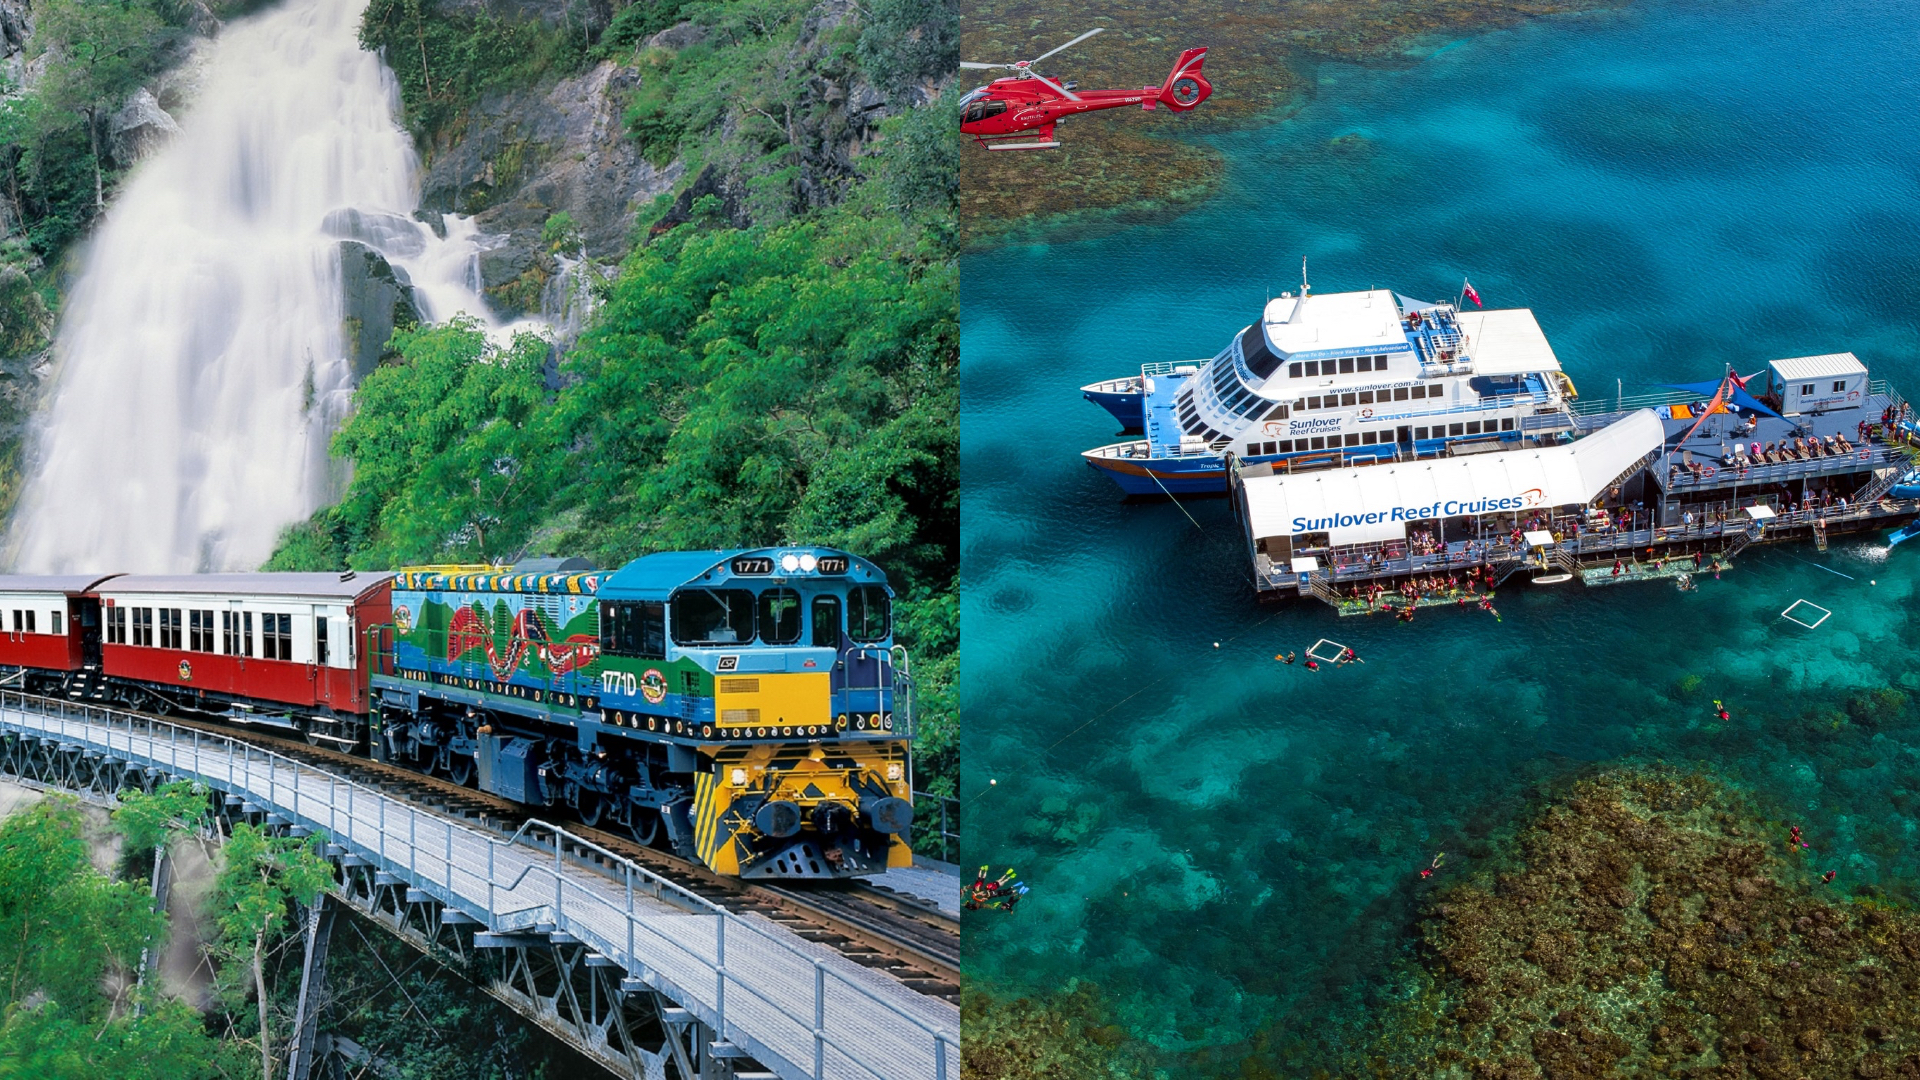 Kuranda (Skyrail & Train) + Sunlover Moore Reef – 2 Day Package